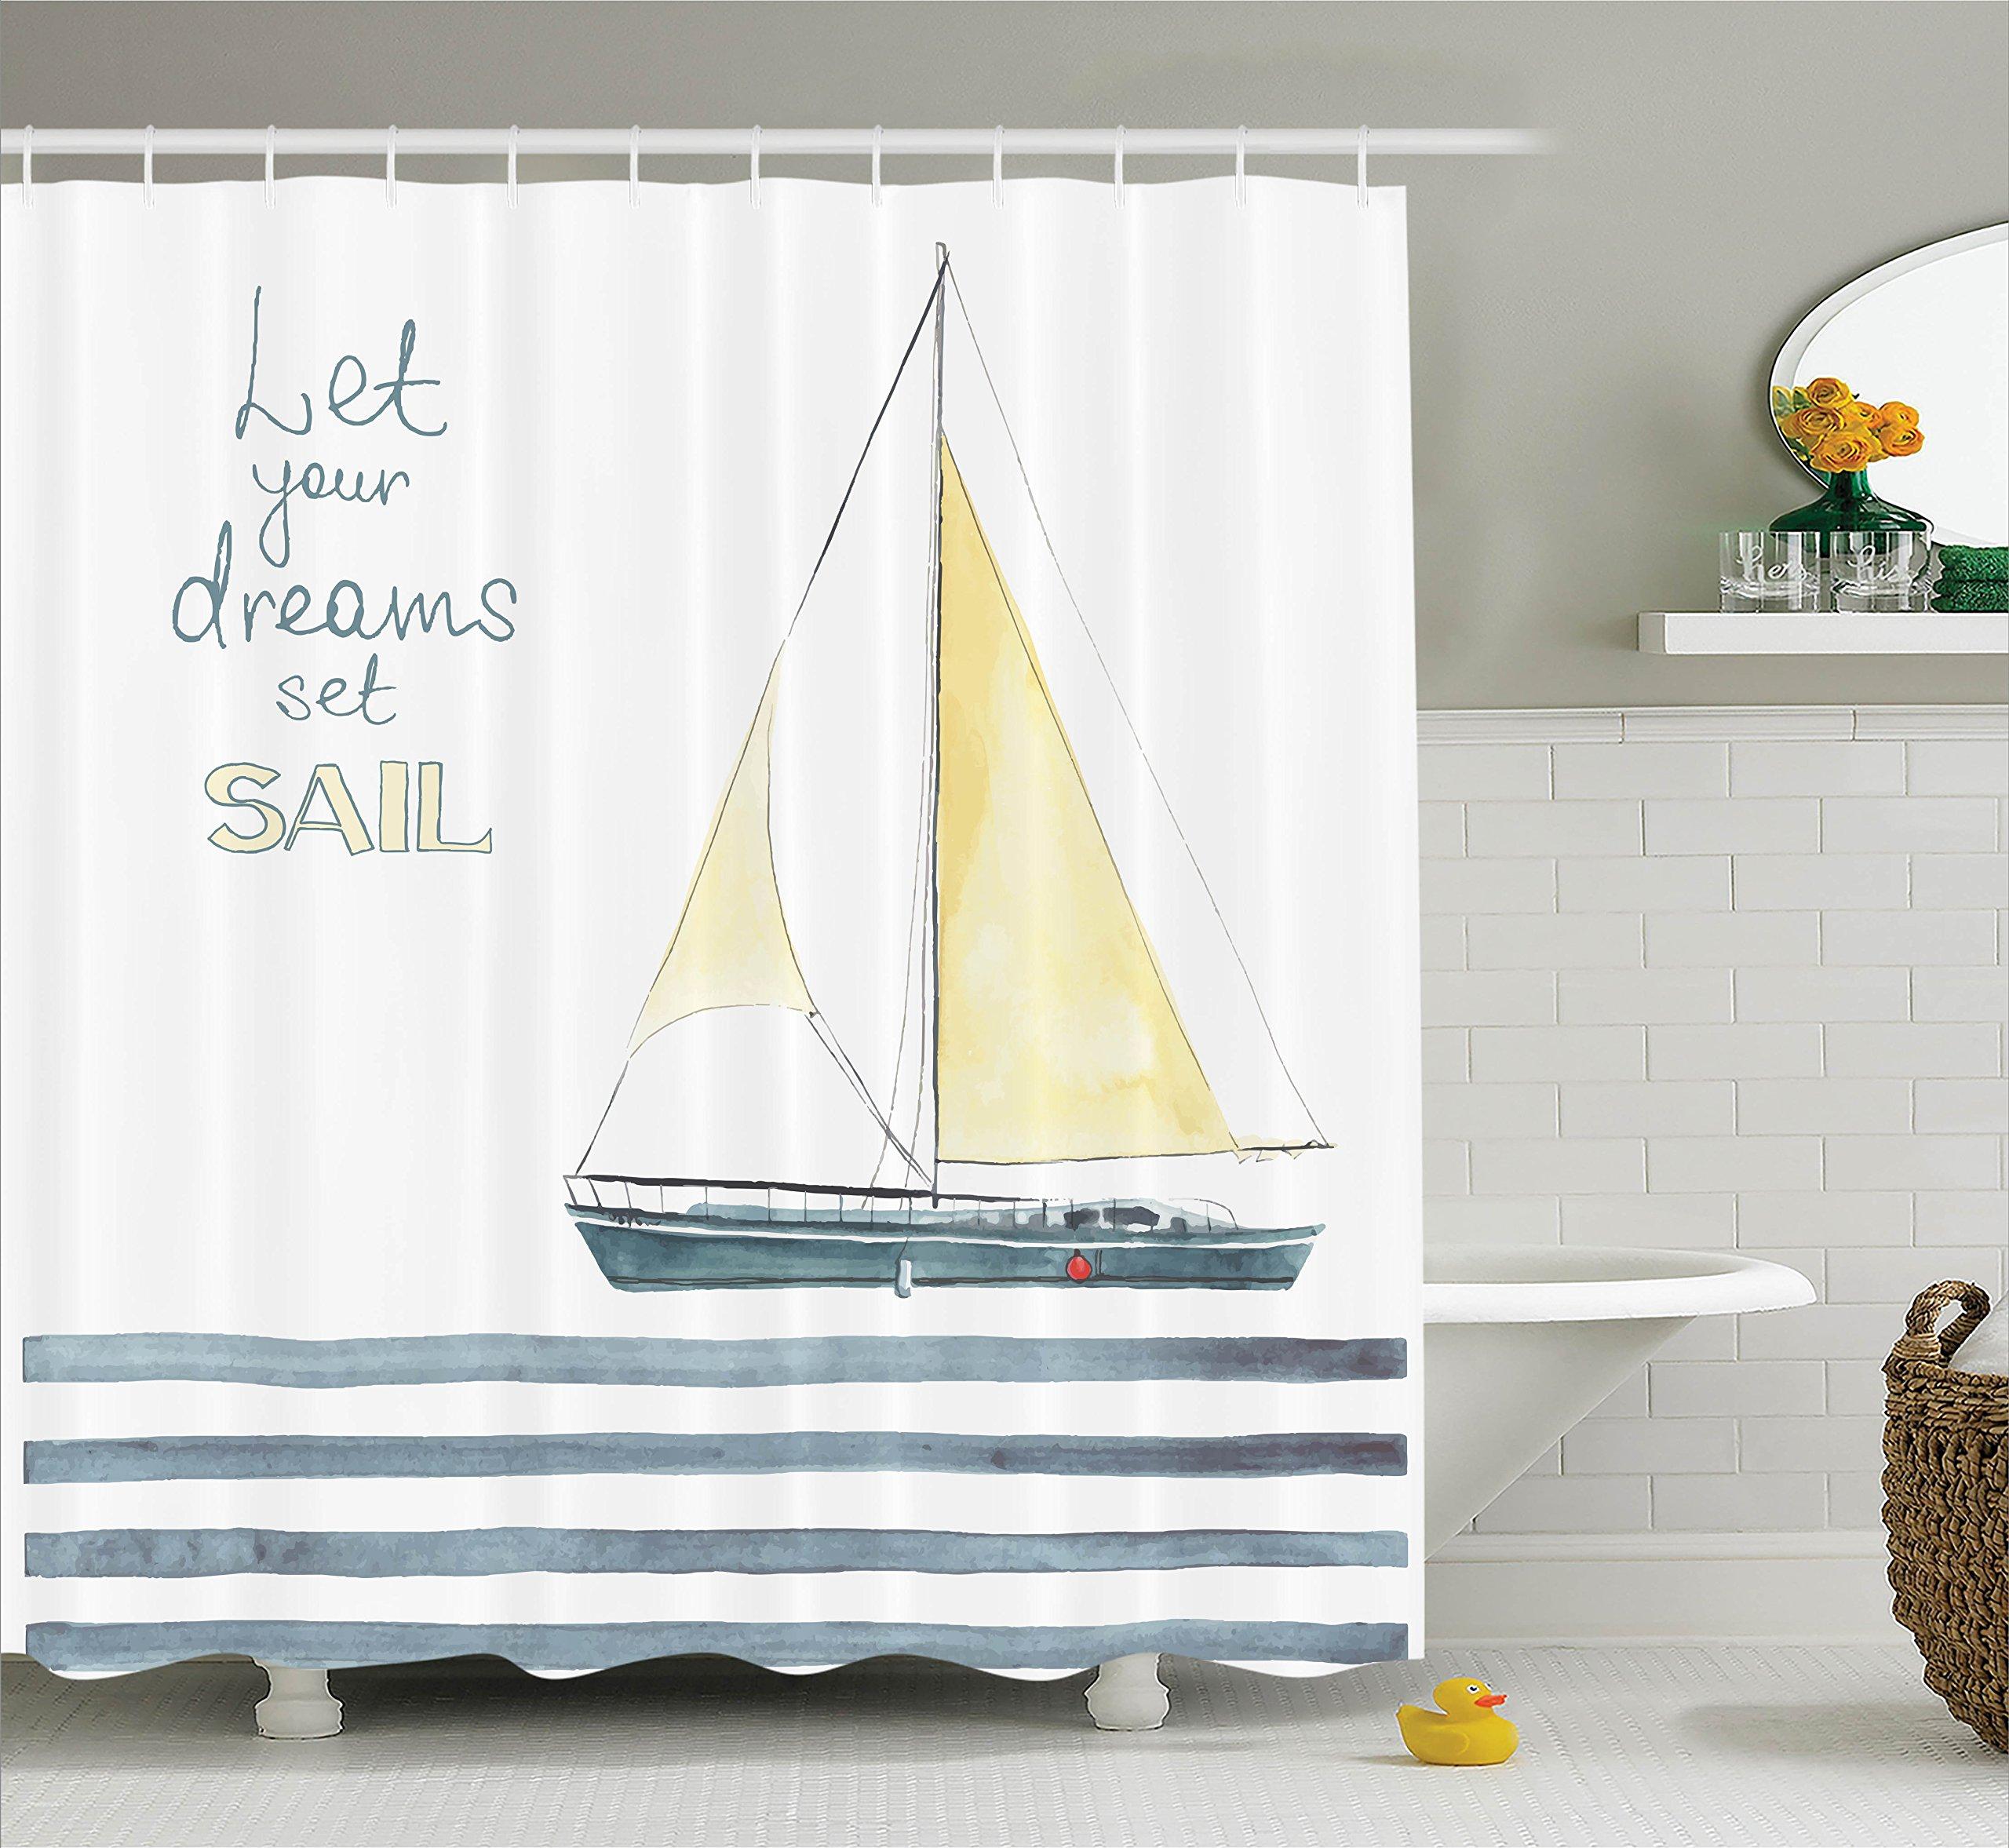 Nautical Bath Art: Amazon.com